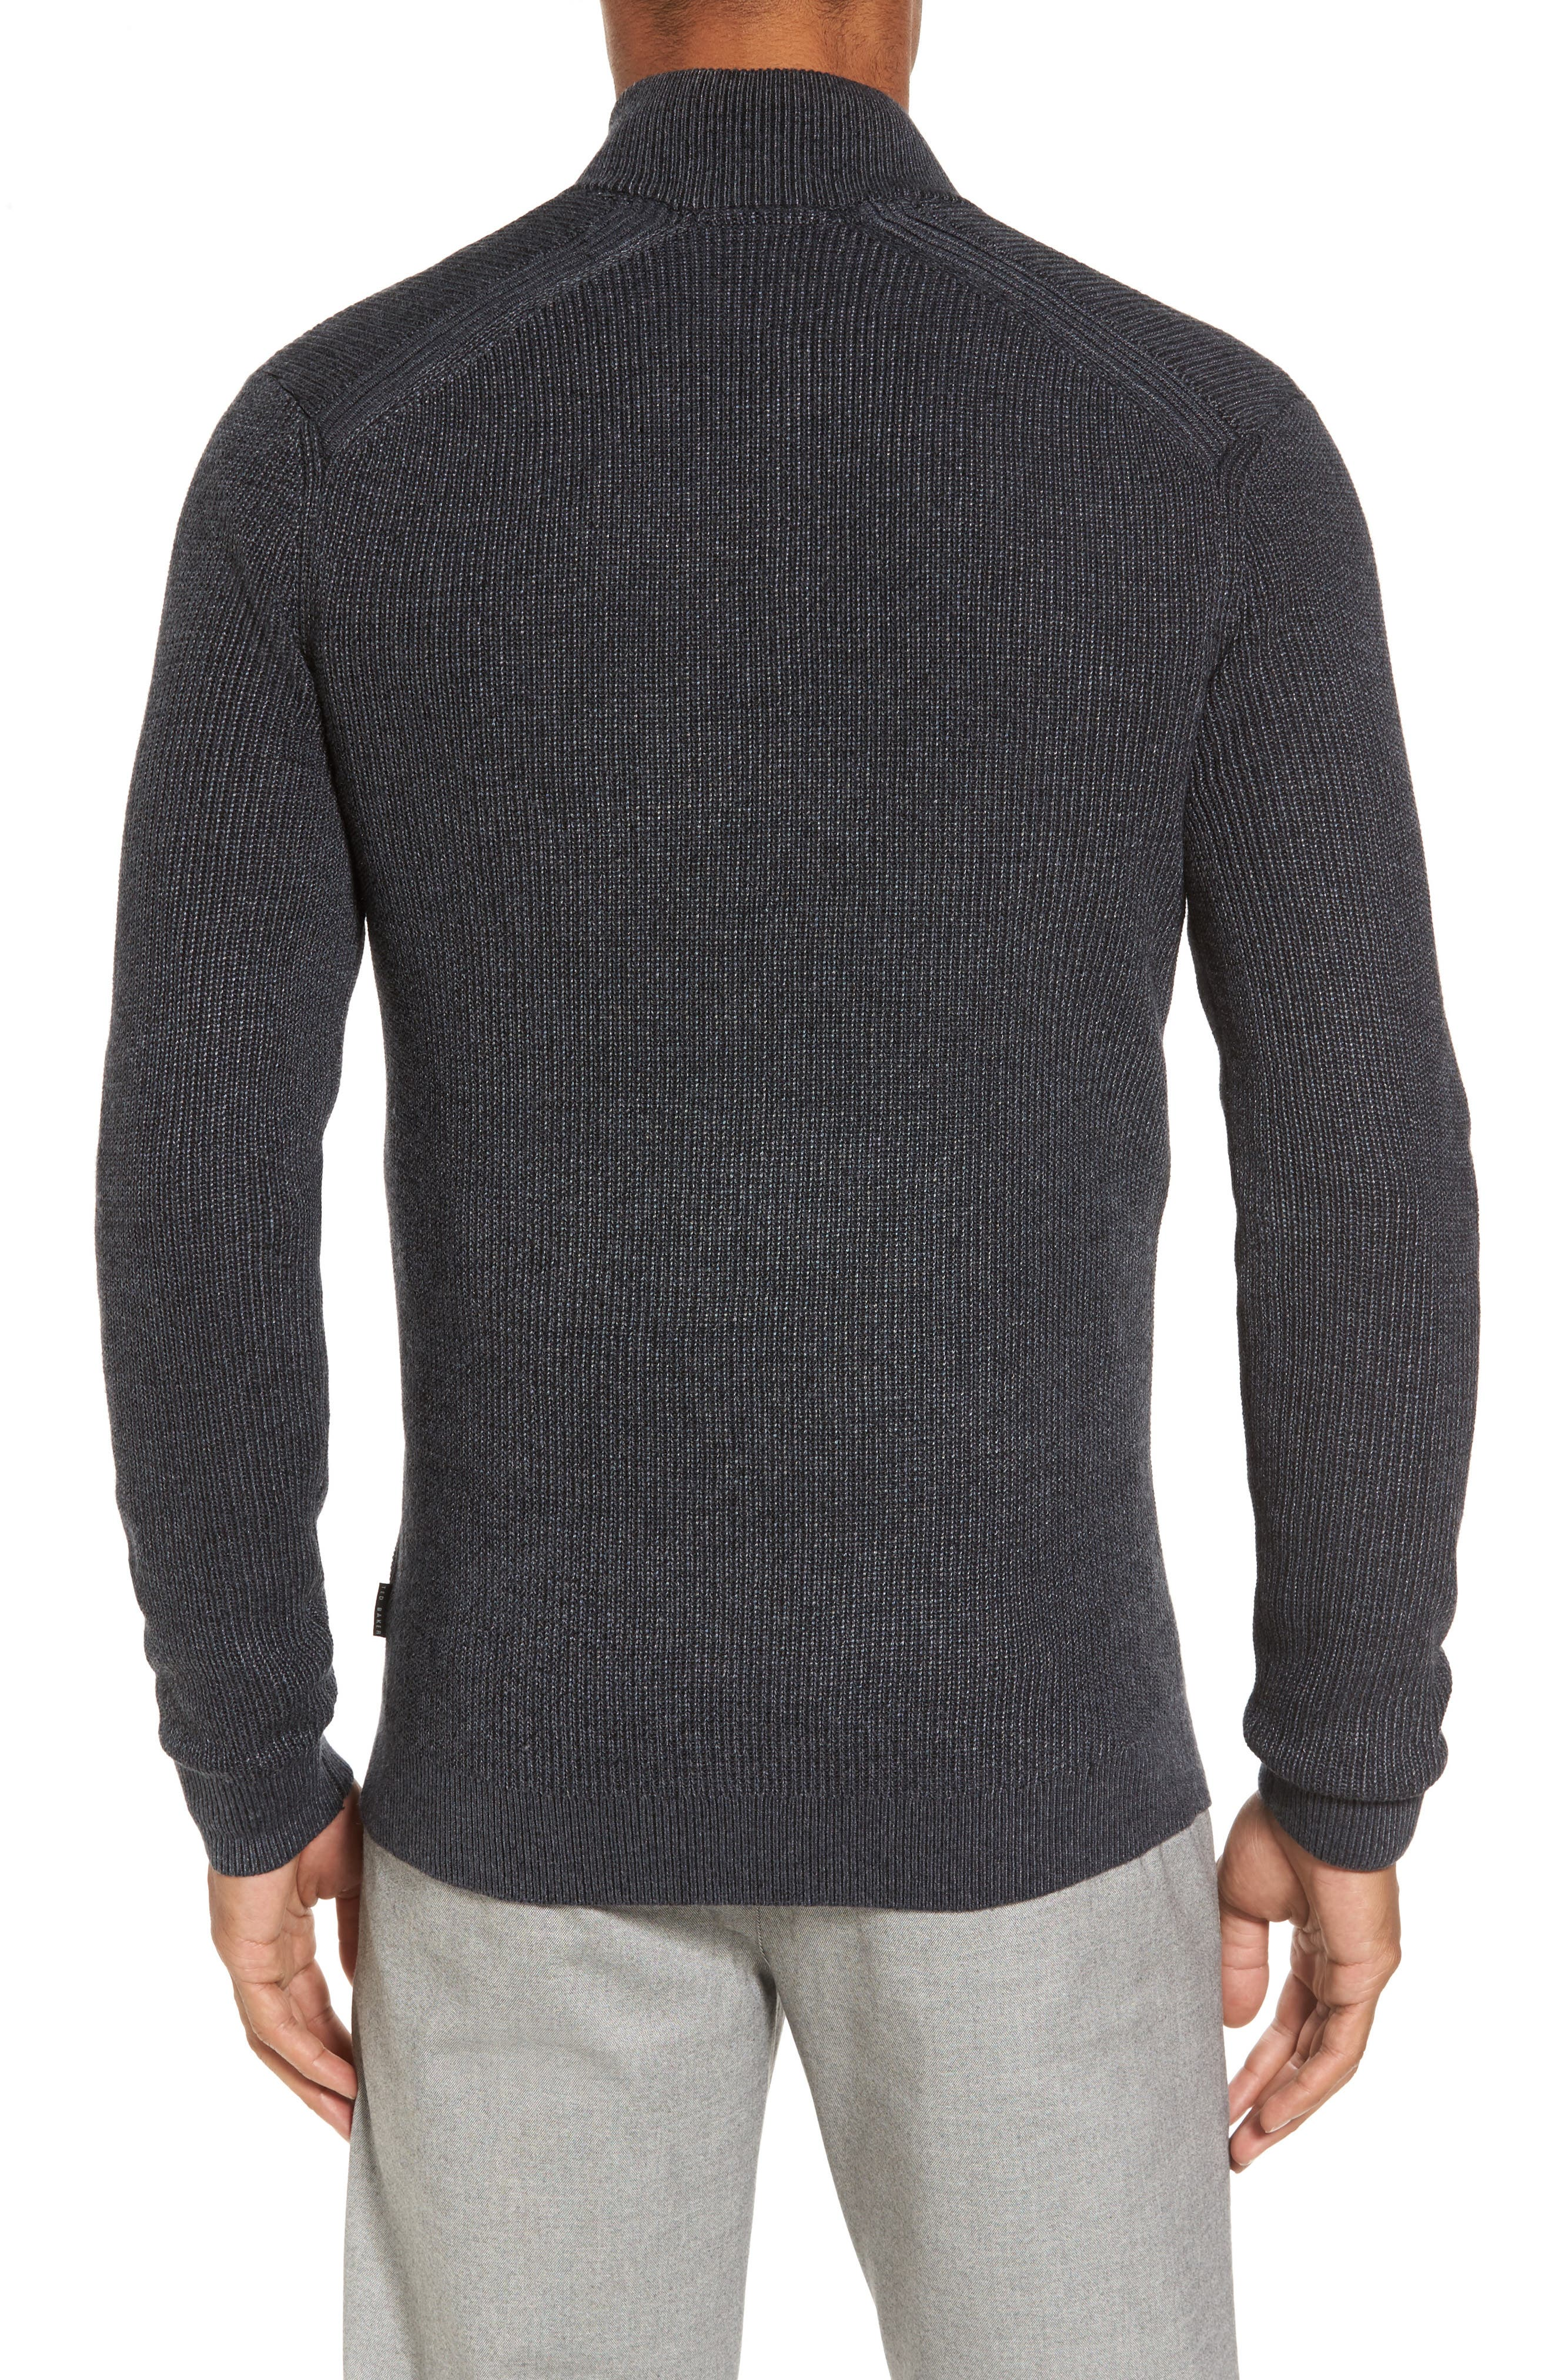 Alternate Image 2  - Ted Baker London Slim Fit Quarter Zip Sweater (Tall)